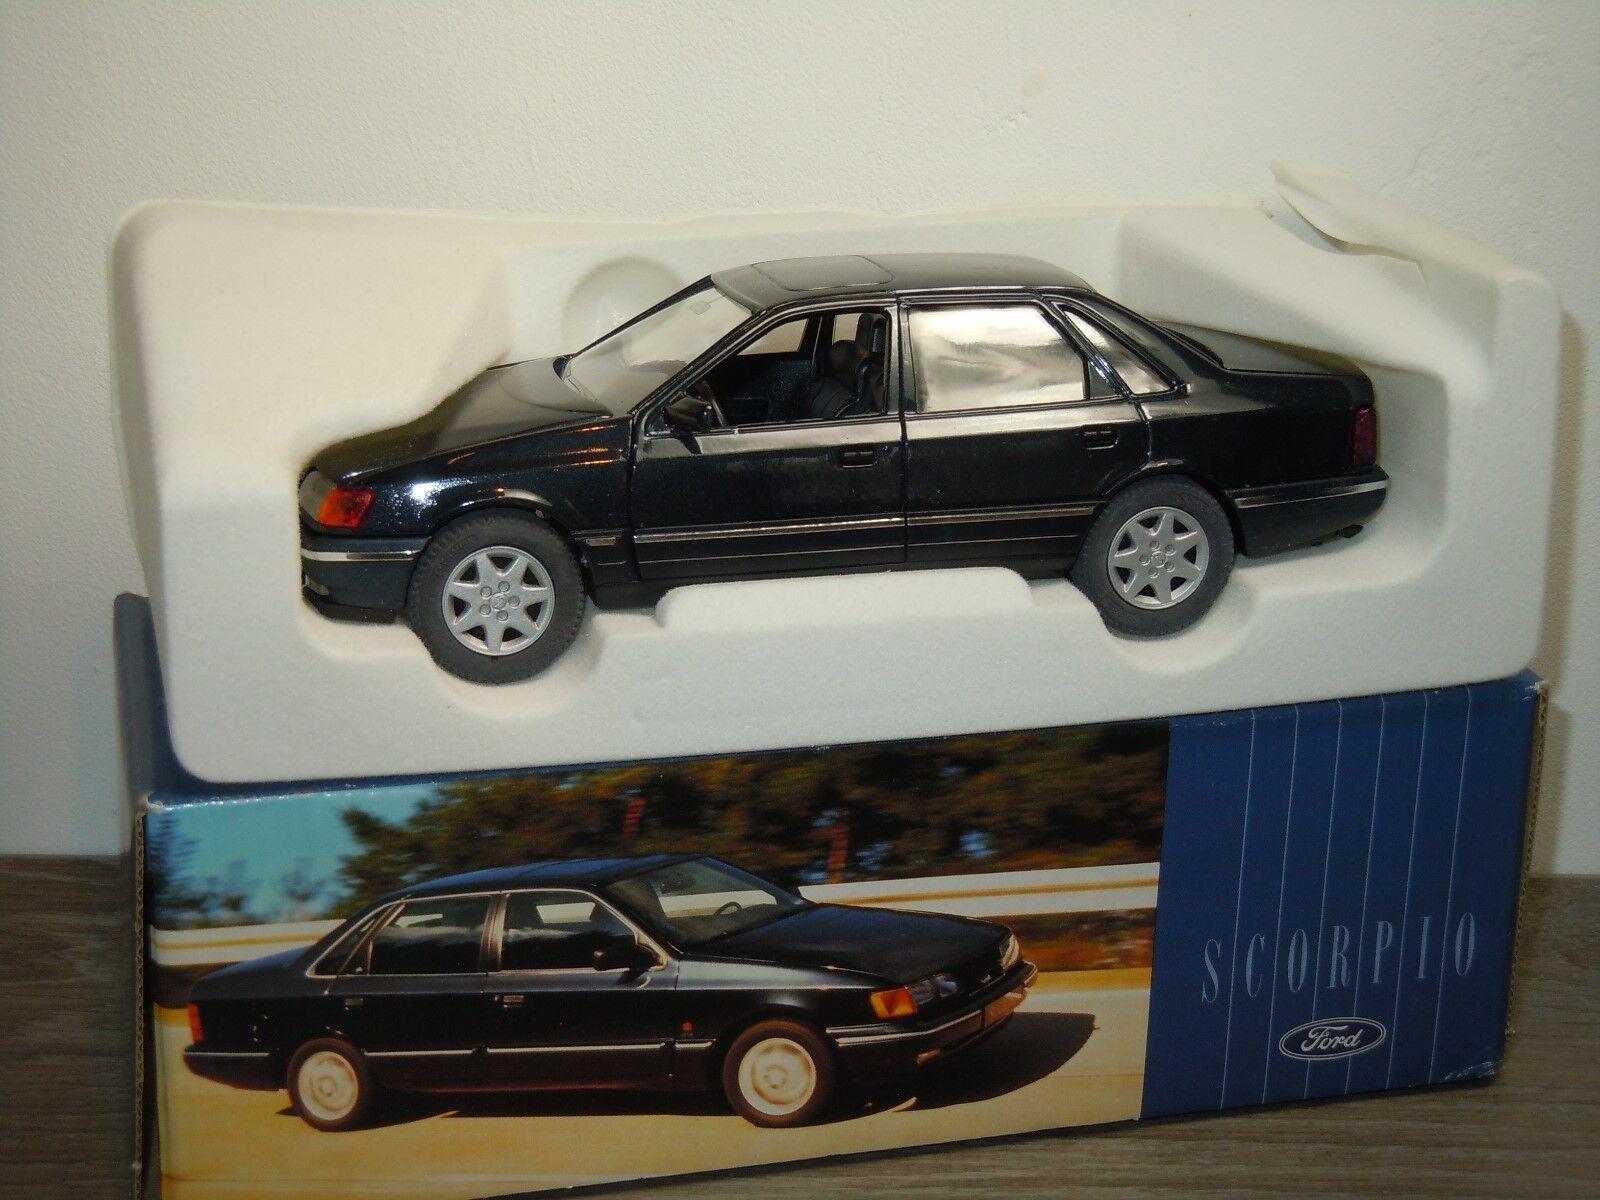 Ford Scorpio Saloon - Schabak 1503 Germany 1 25 in Box 33171